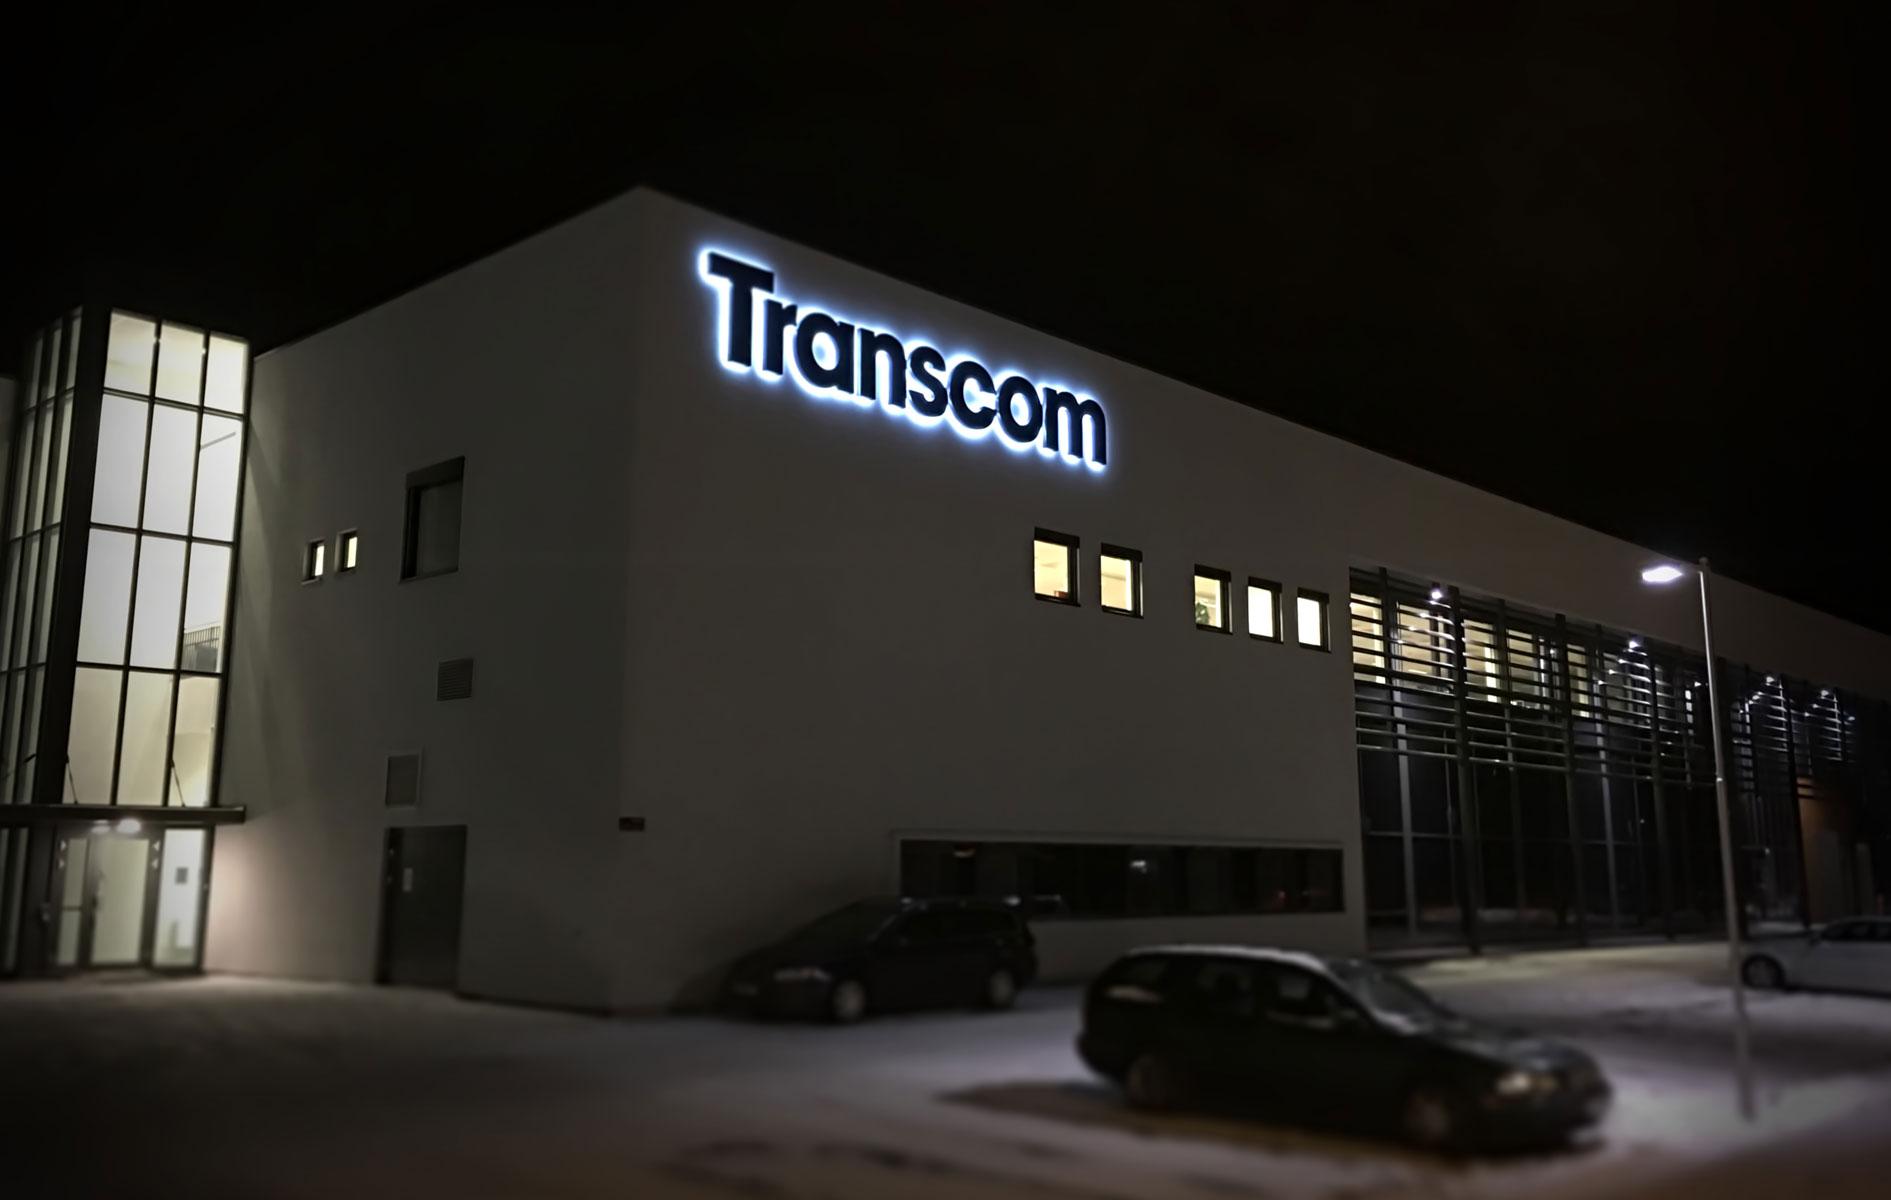 Fasadeskilt til Transcom